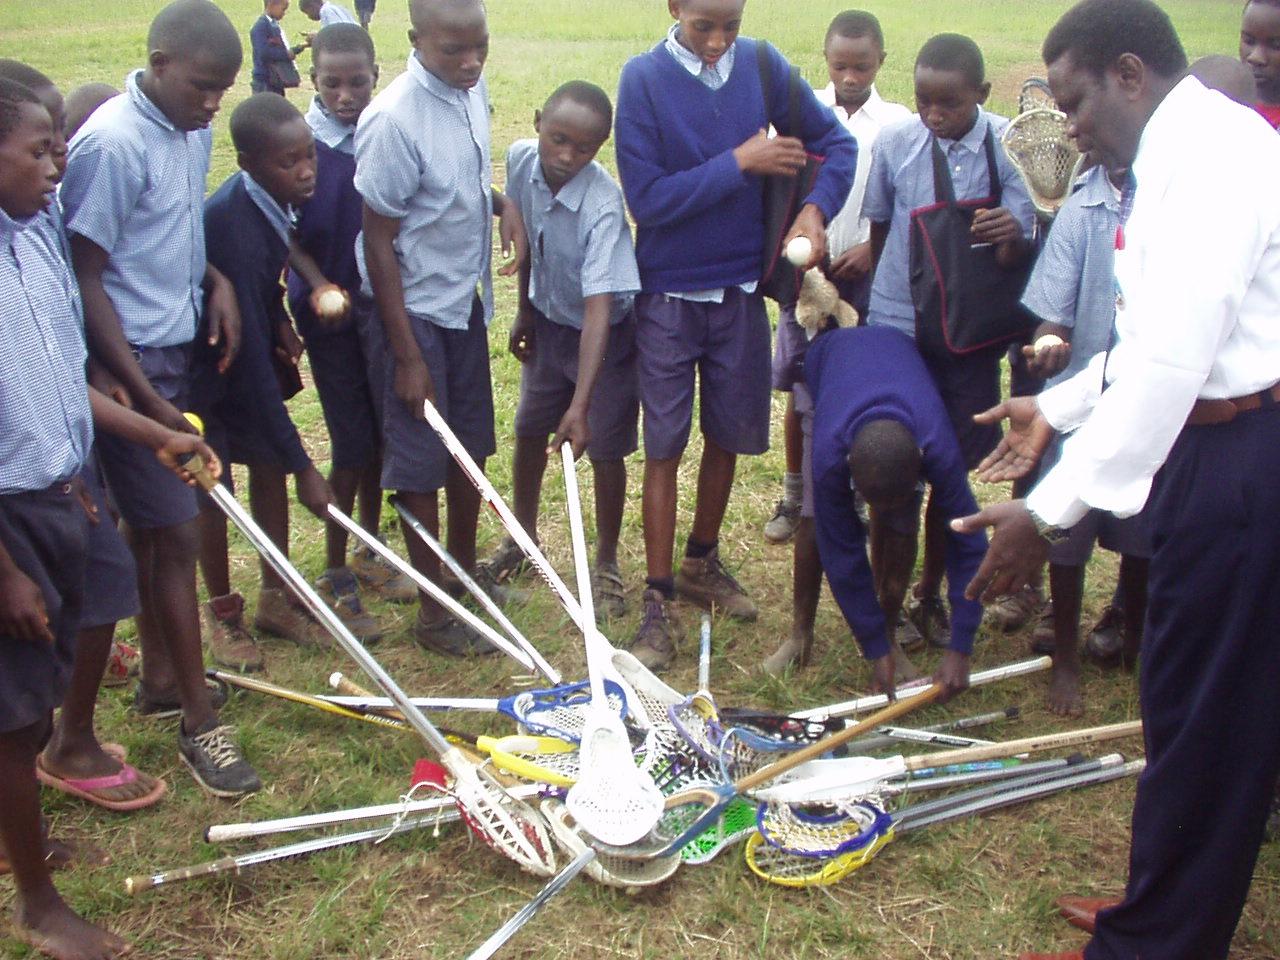 Lacrosse sticks donated to Kenya by World teacher